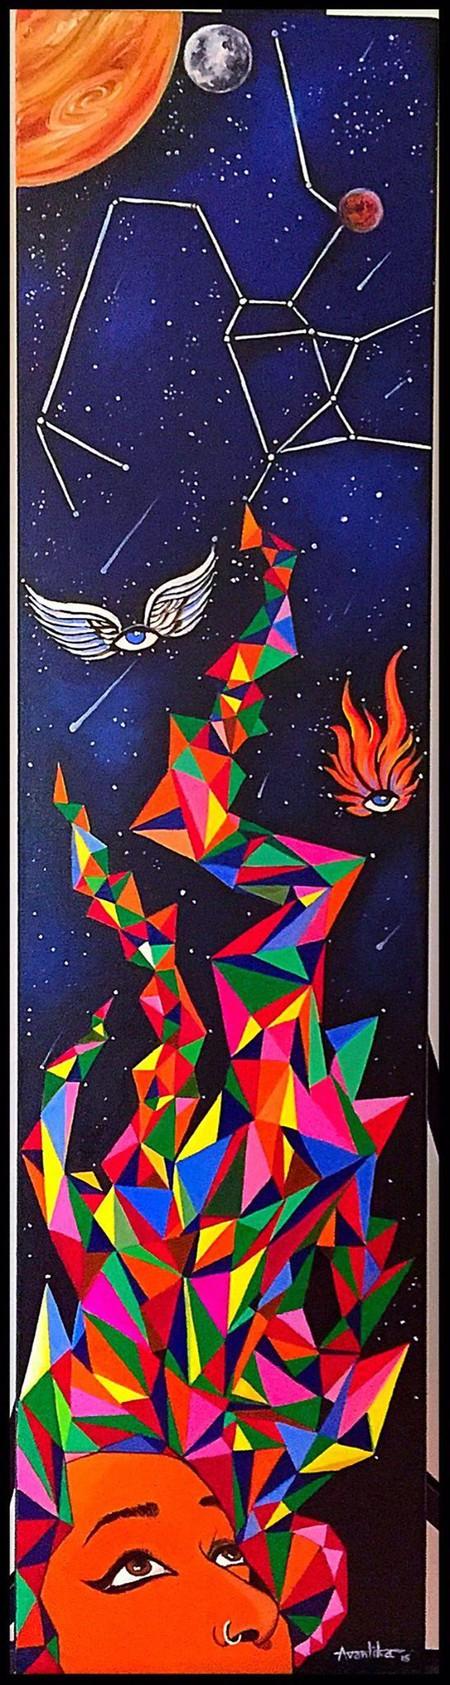 'Searching for my destiny in the stars'. Acrylic on canvas. Astrology series   Courtesy Avantika Mathur